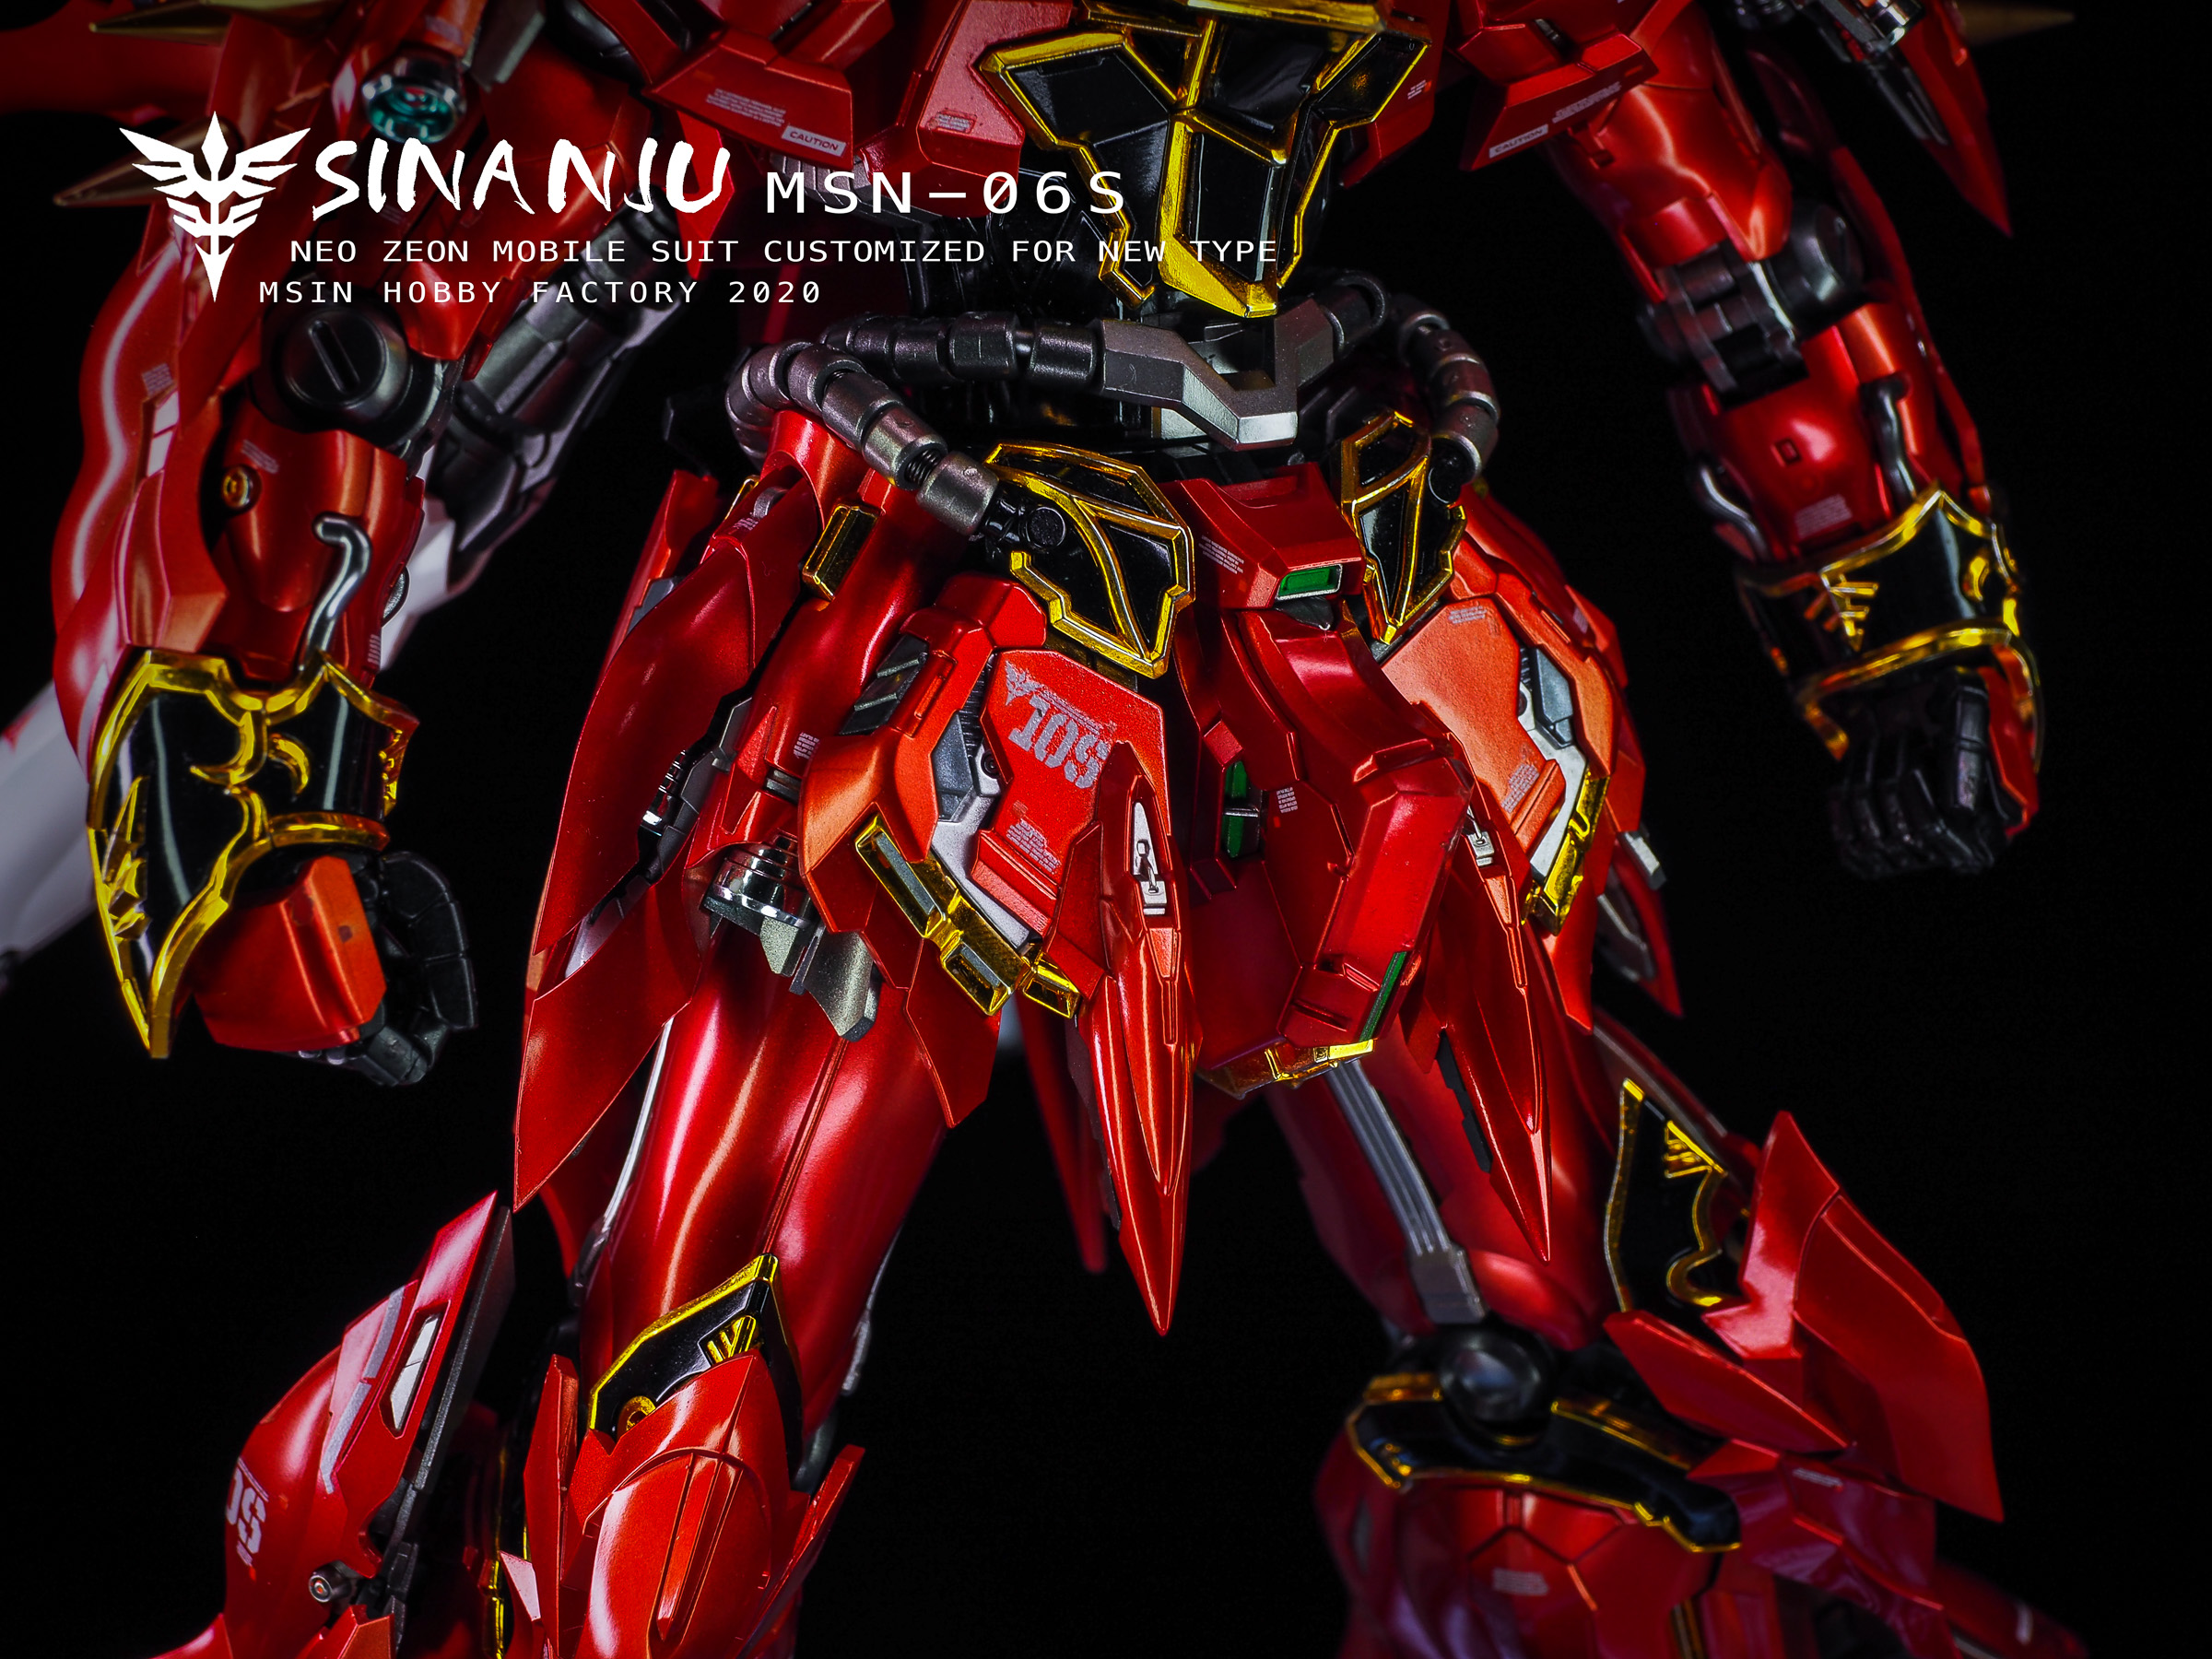 S437_6_takumi_sinanju_red_006.jpg